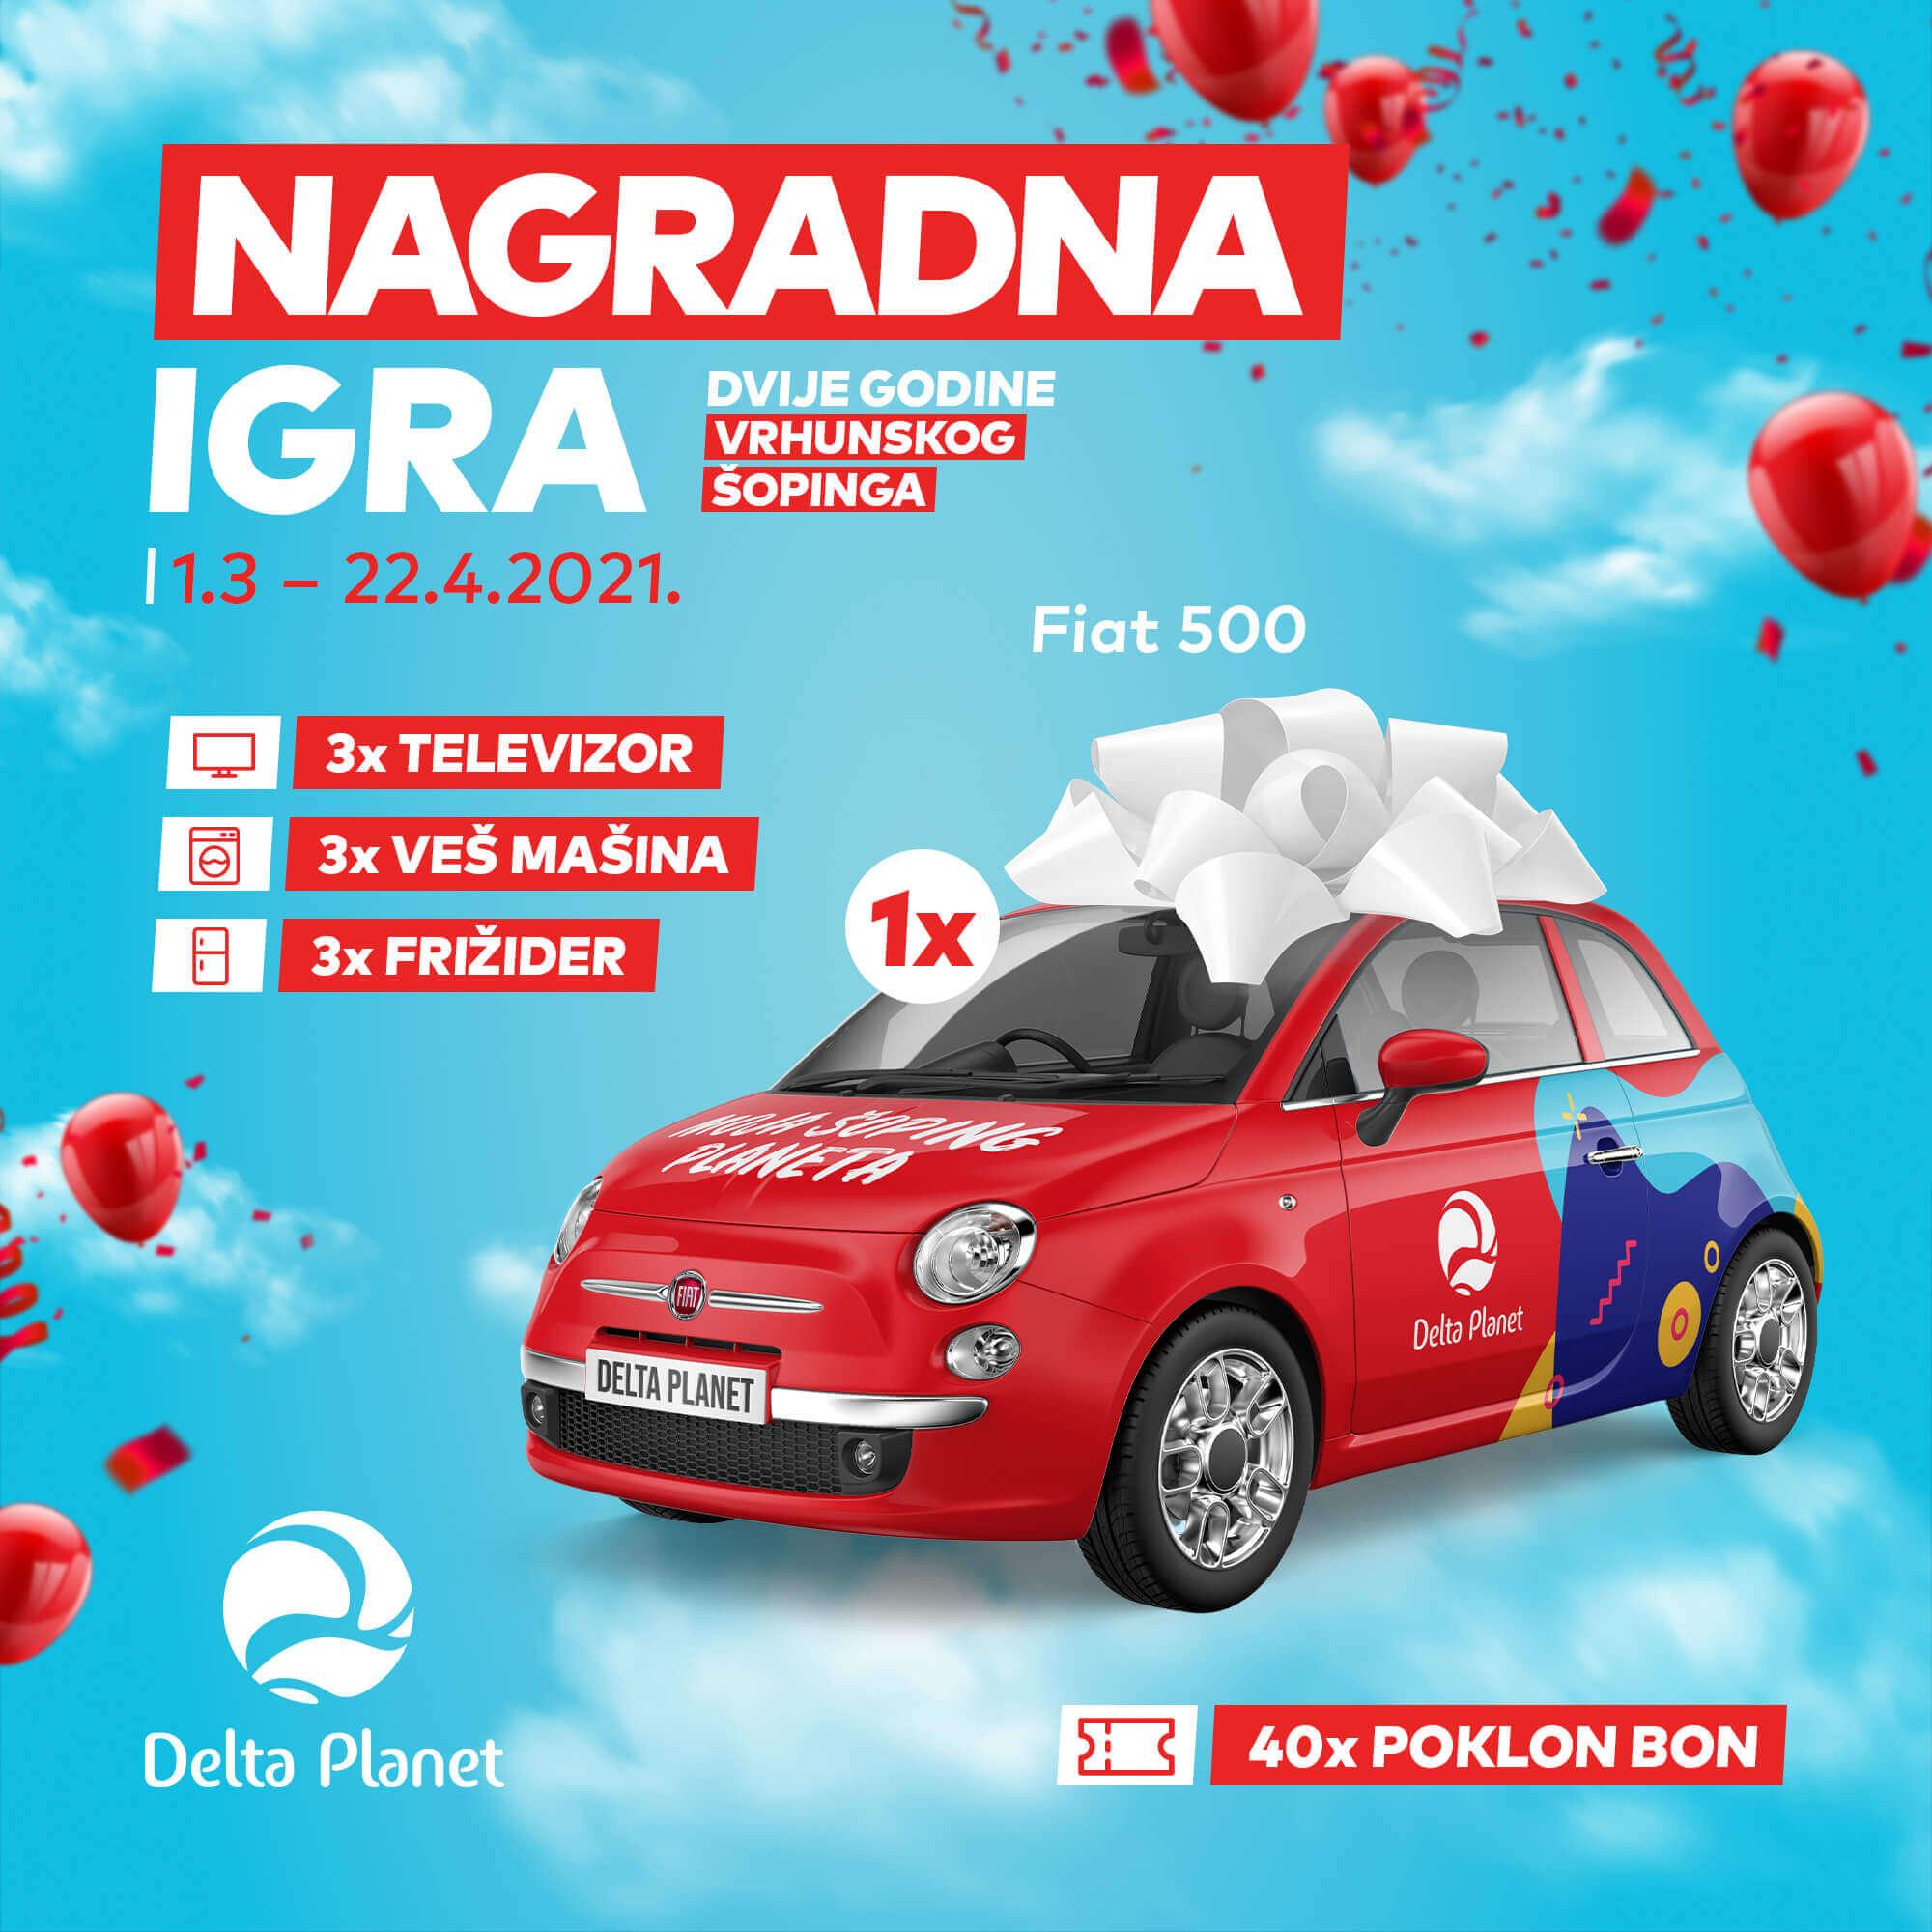 Delta Planet, nagradna igra, FIAT 500, nagrade, pokloni